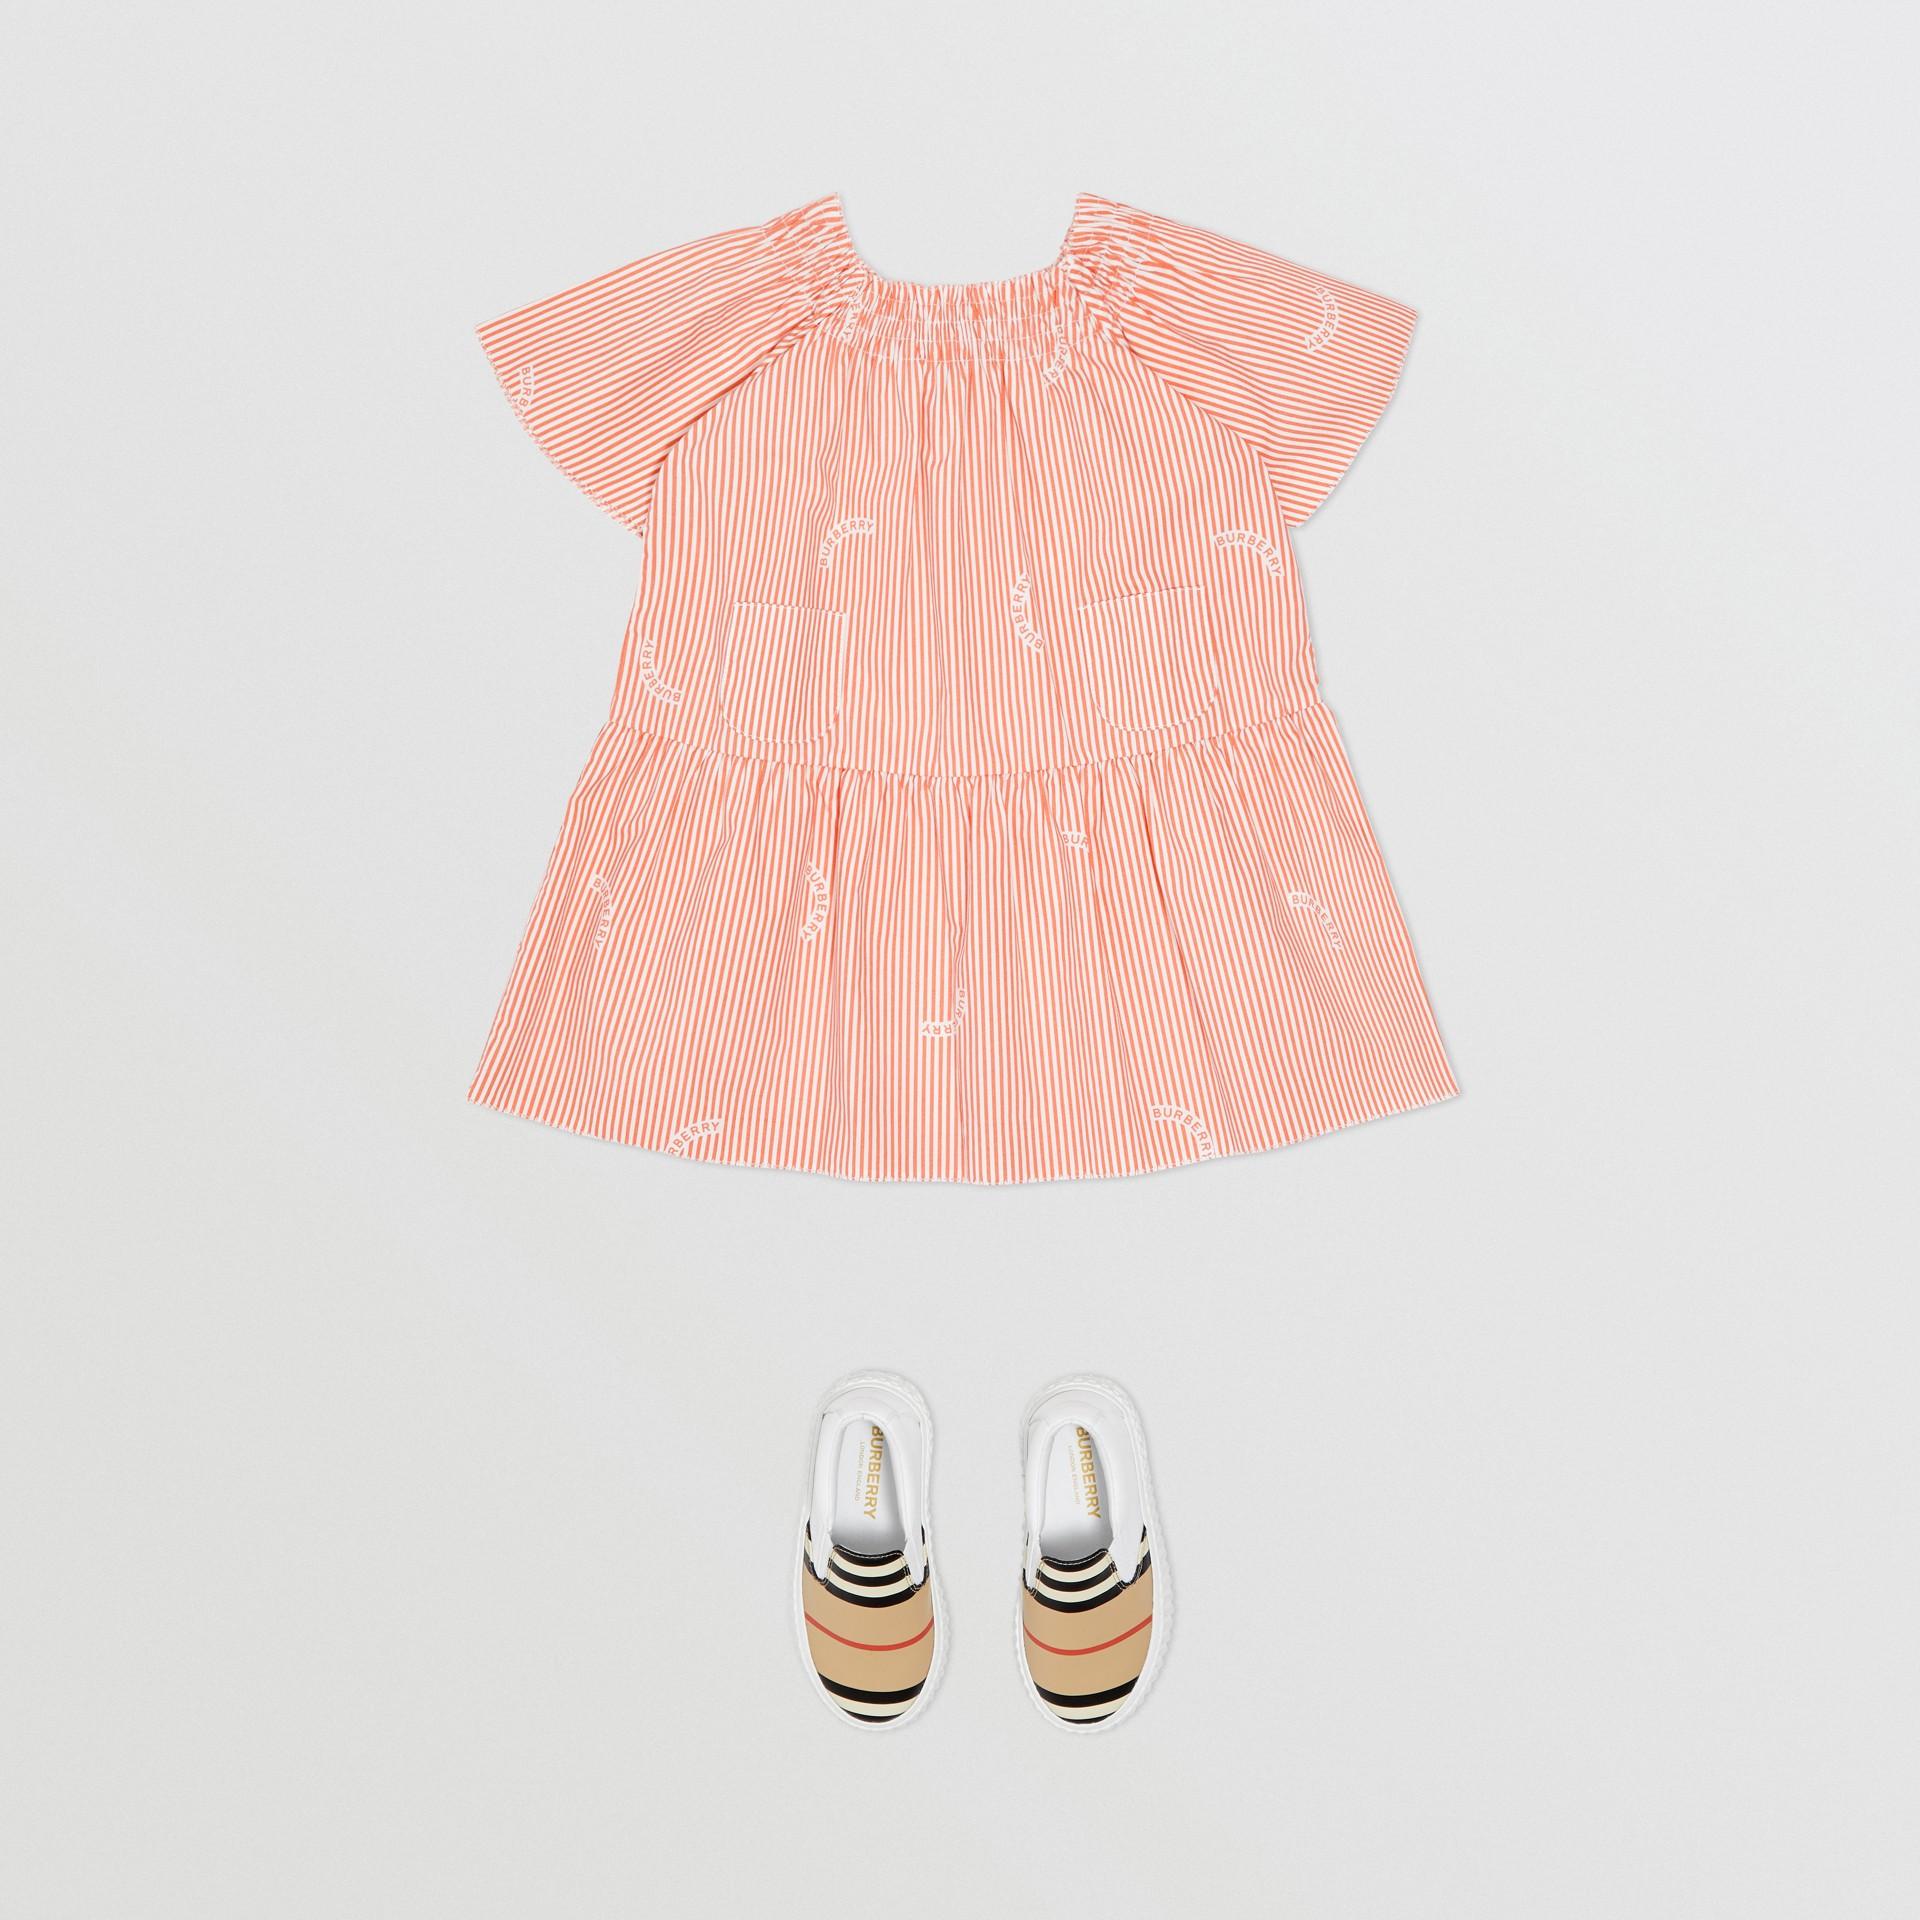 Ruched Neck Stripe Print Cotton Silk Dress in Coral Orange - Children | Burberry United Kingdom - gallery image 2